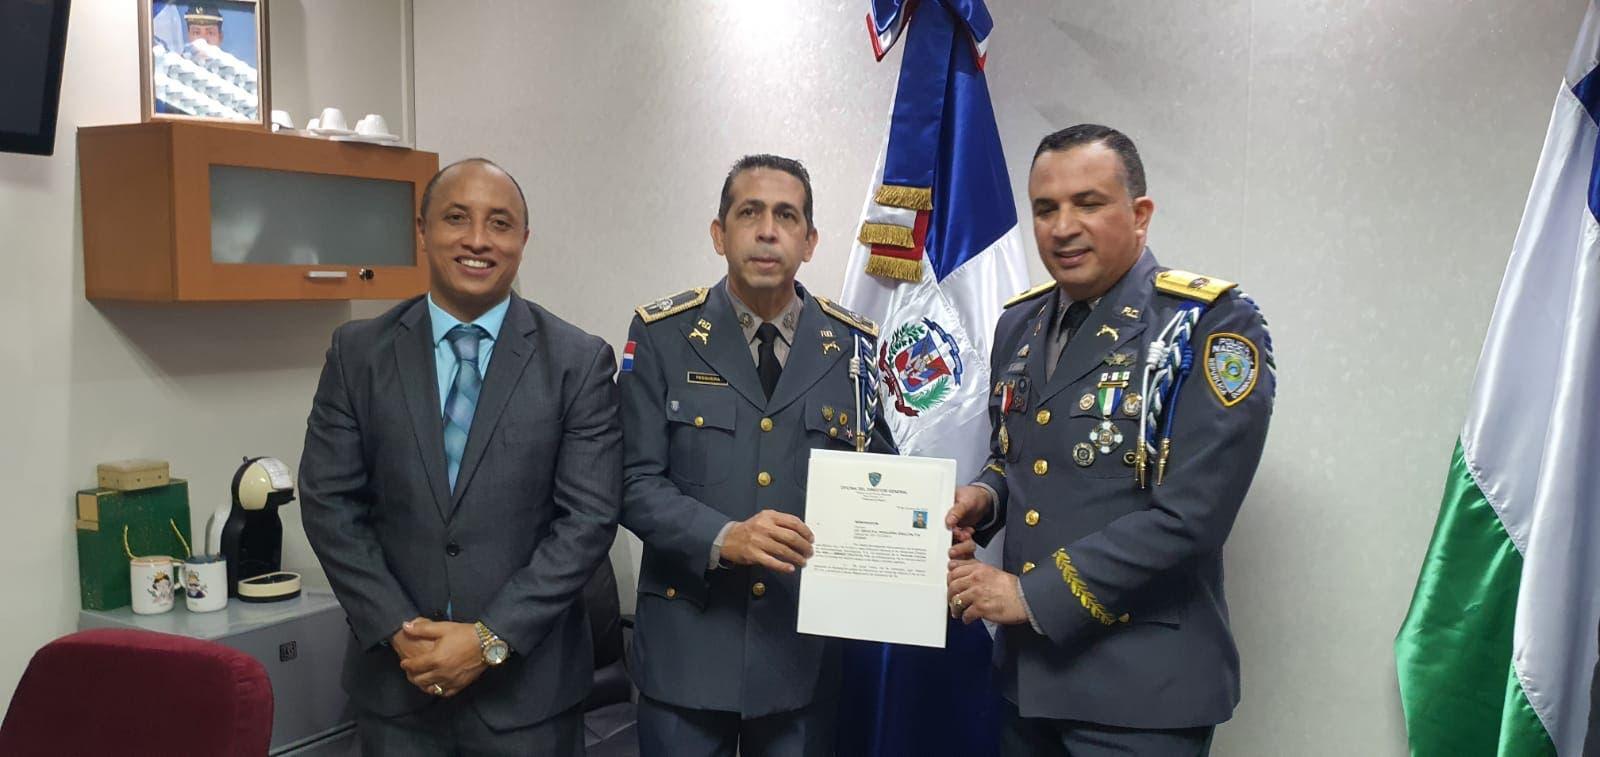 Designan a Diego Pesqueira vocero de la Policía Nacional